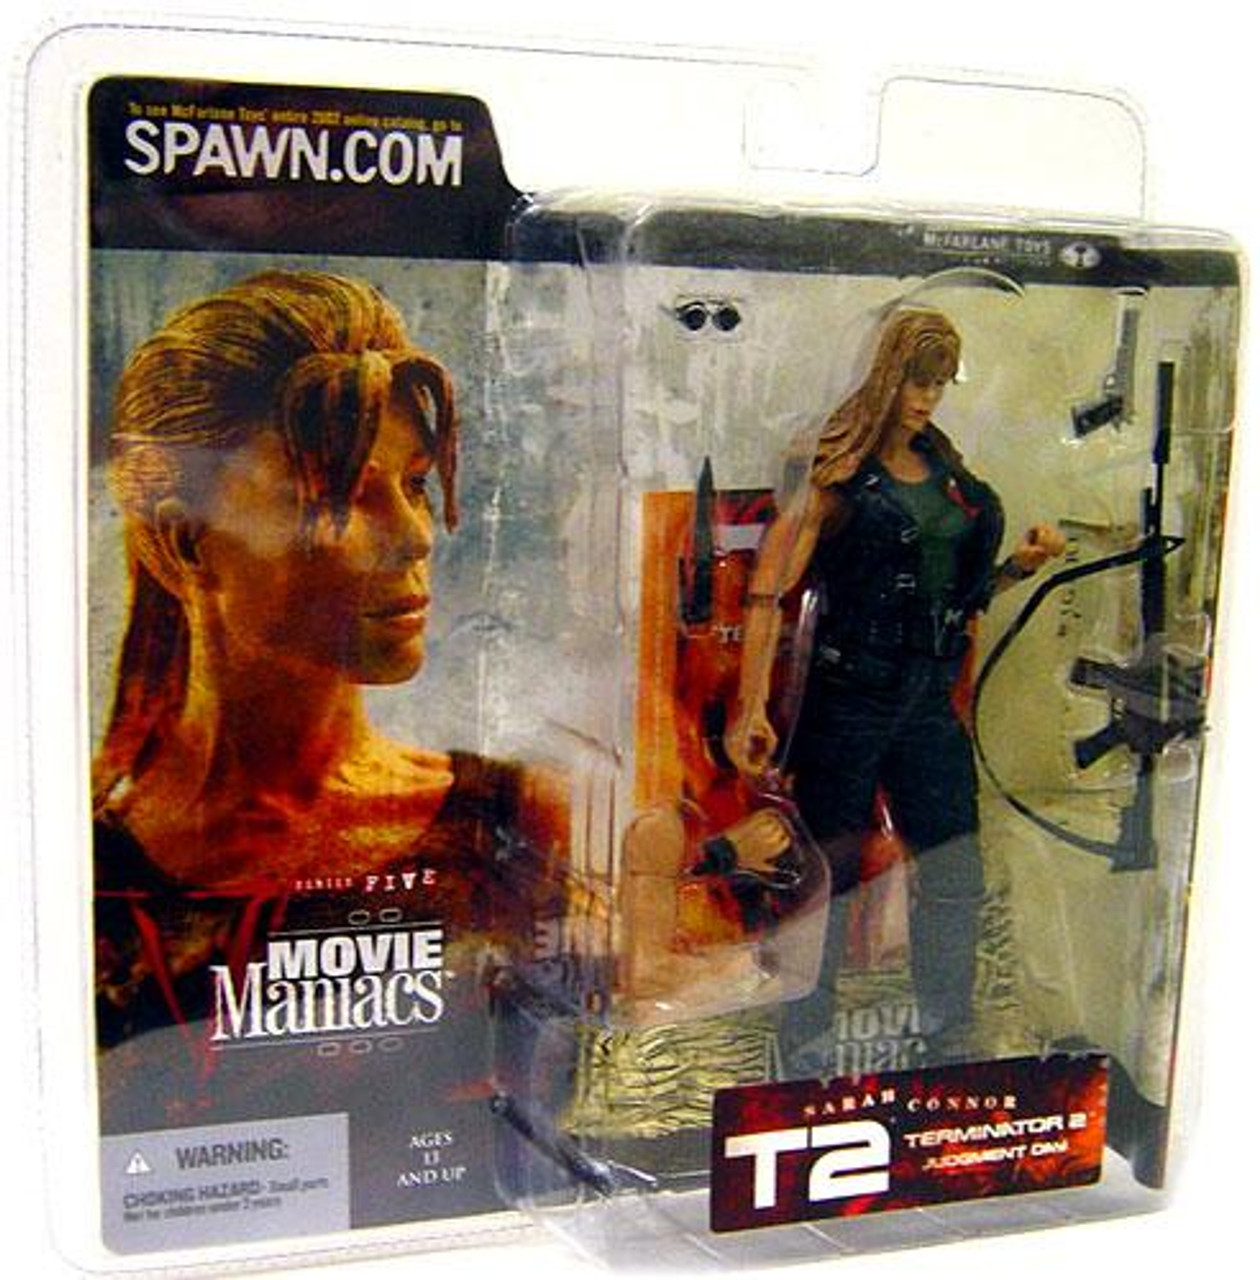 McFarlane Toys Terminator 2 Judgment Day Movie Maniacs Series 5 Sarah Connor Action Figure [Straight Hair]